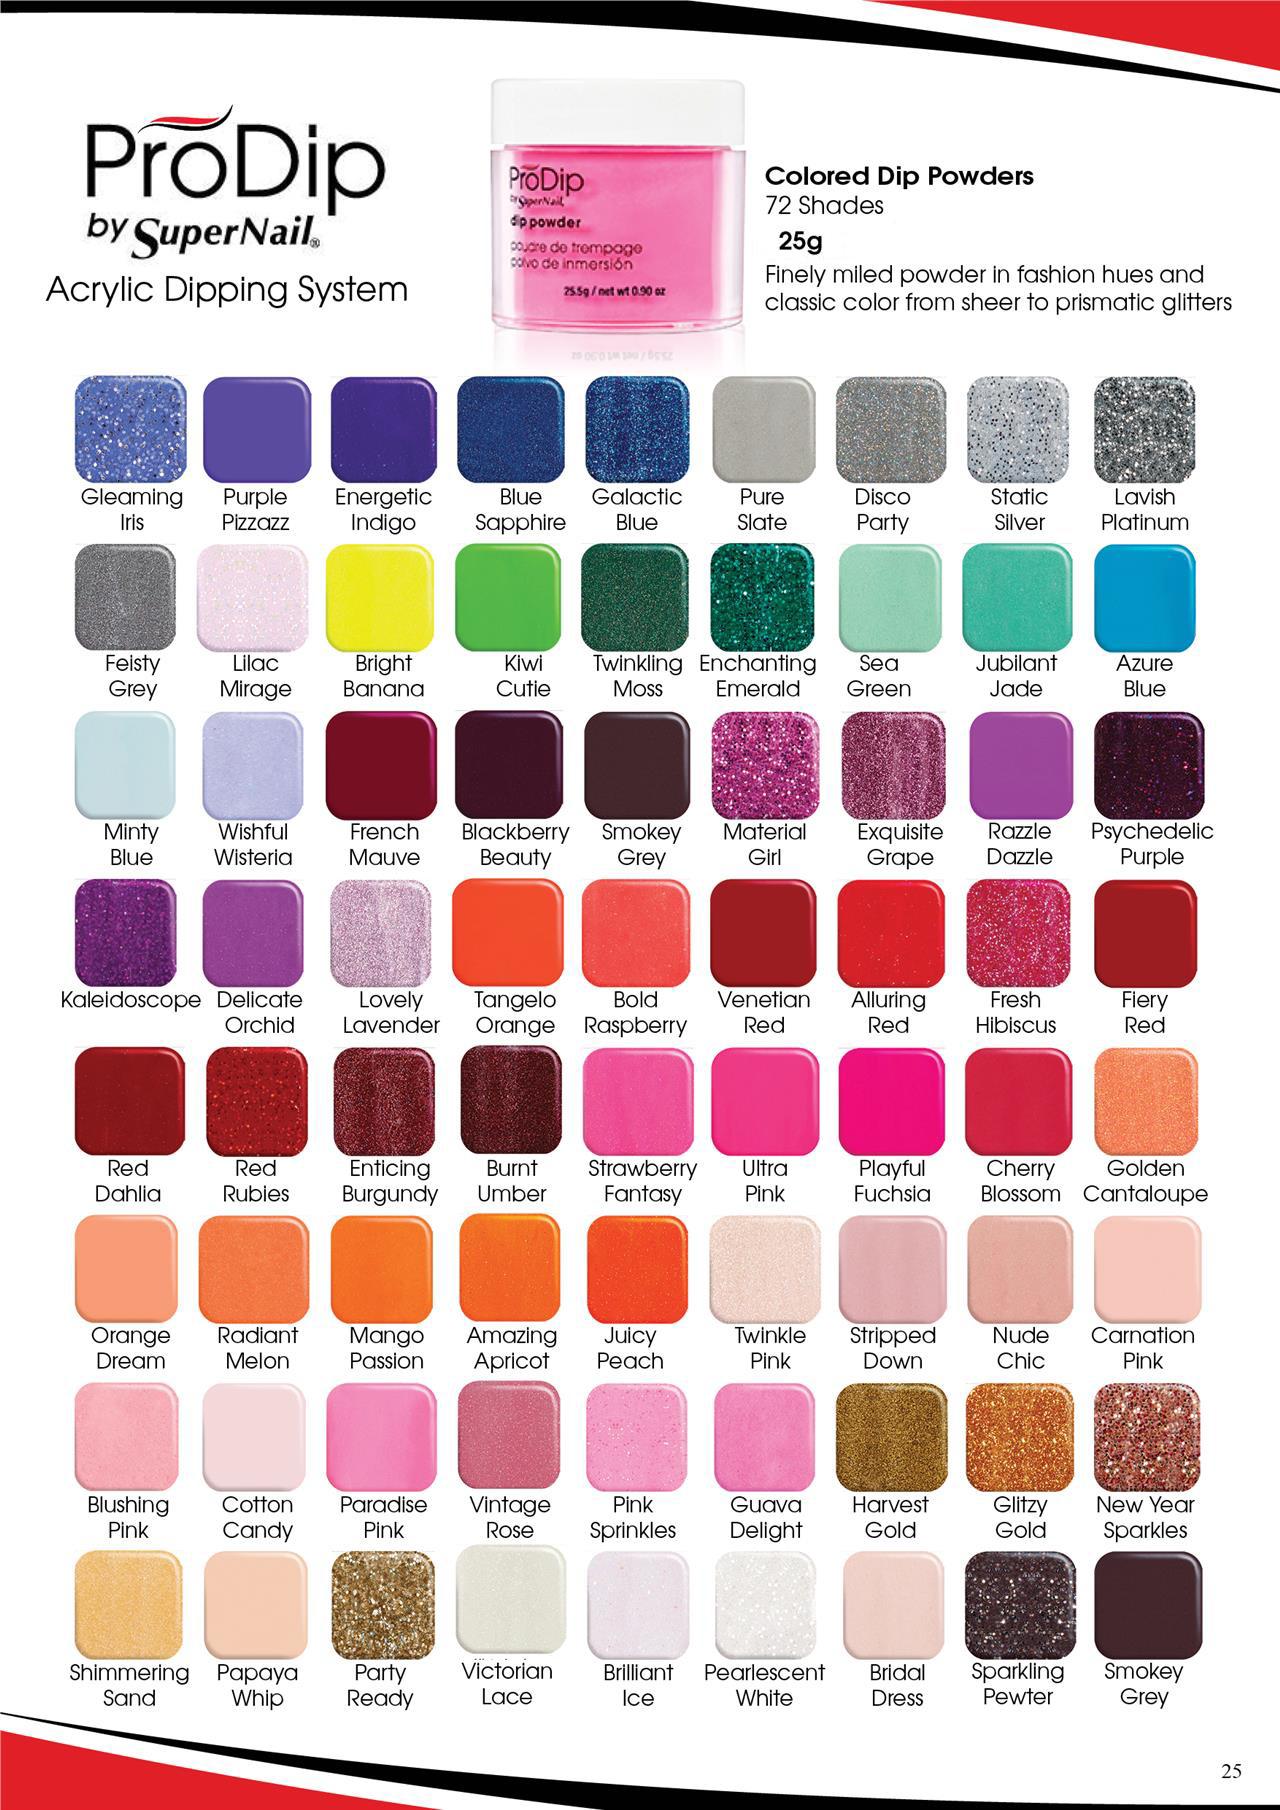 Aqua detox color chart gallery free any chart examples aqua detox color chart image collections free any chart examples aqua detox color chart image collections nvjuhfo Choice Image